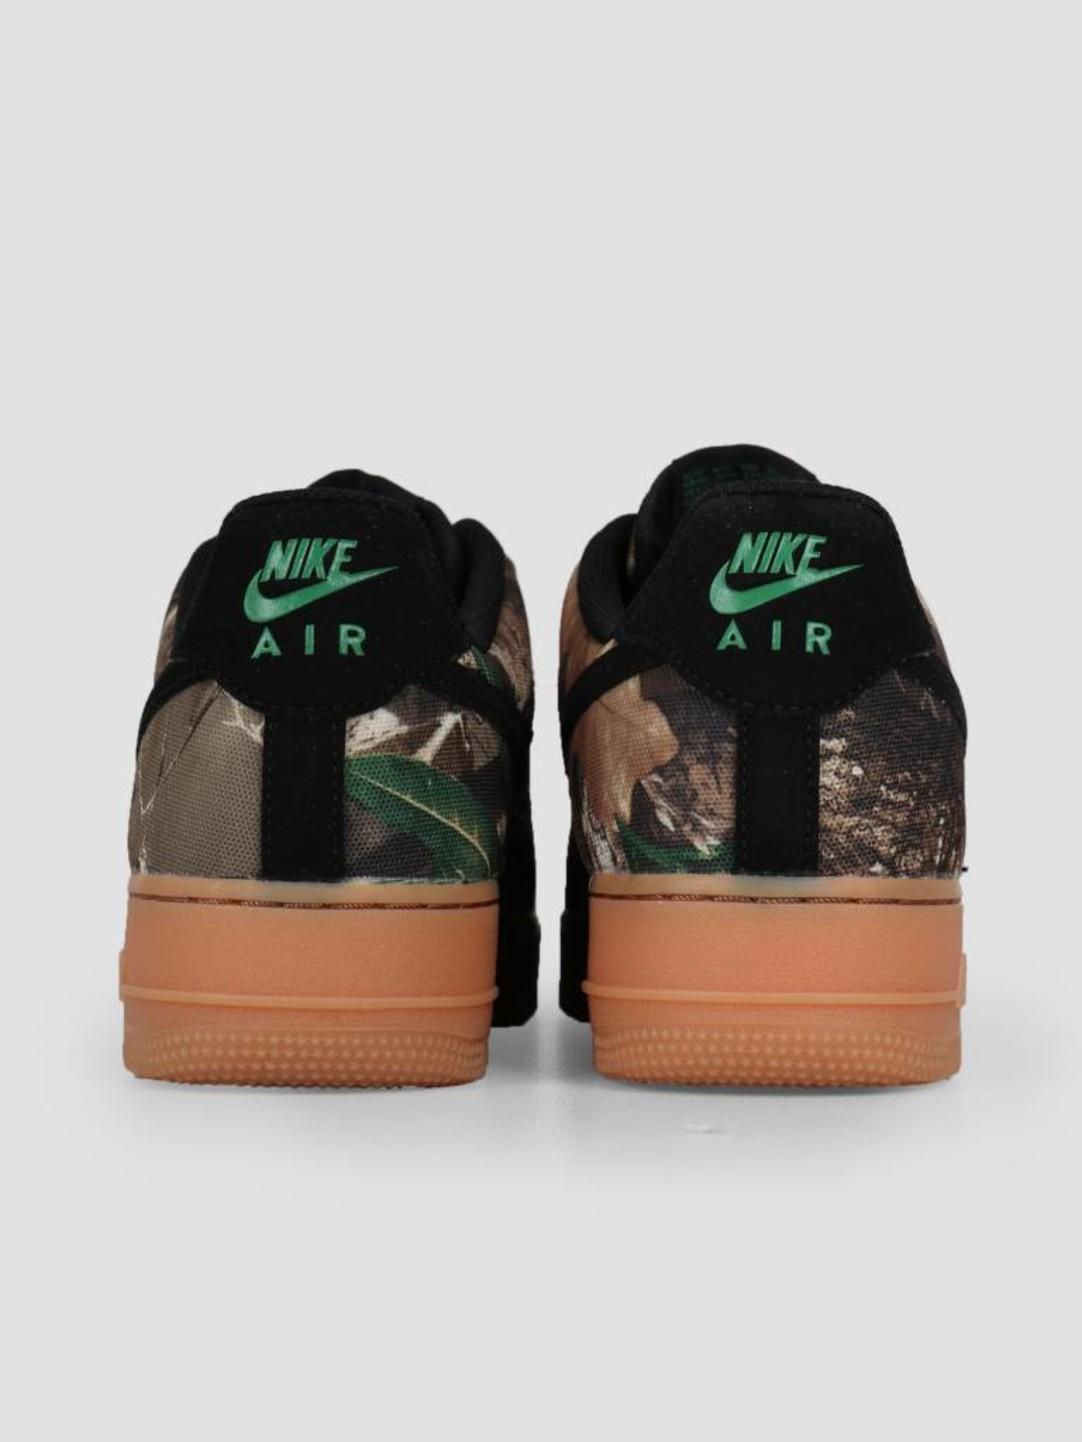 Nike Nike Air Force 1 '07 Lv8 3 Black Black-Aloe Verde-Gum Med Brown Ao2441-001